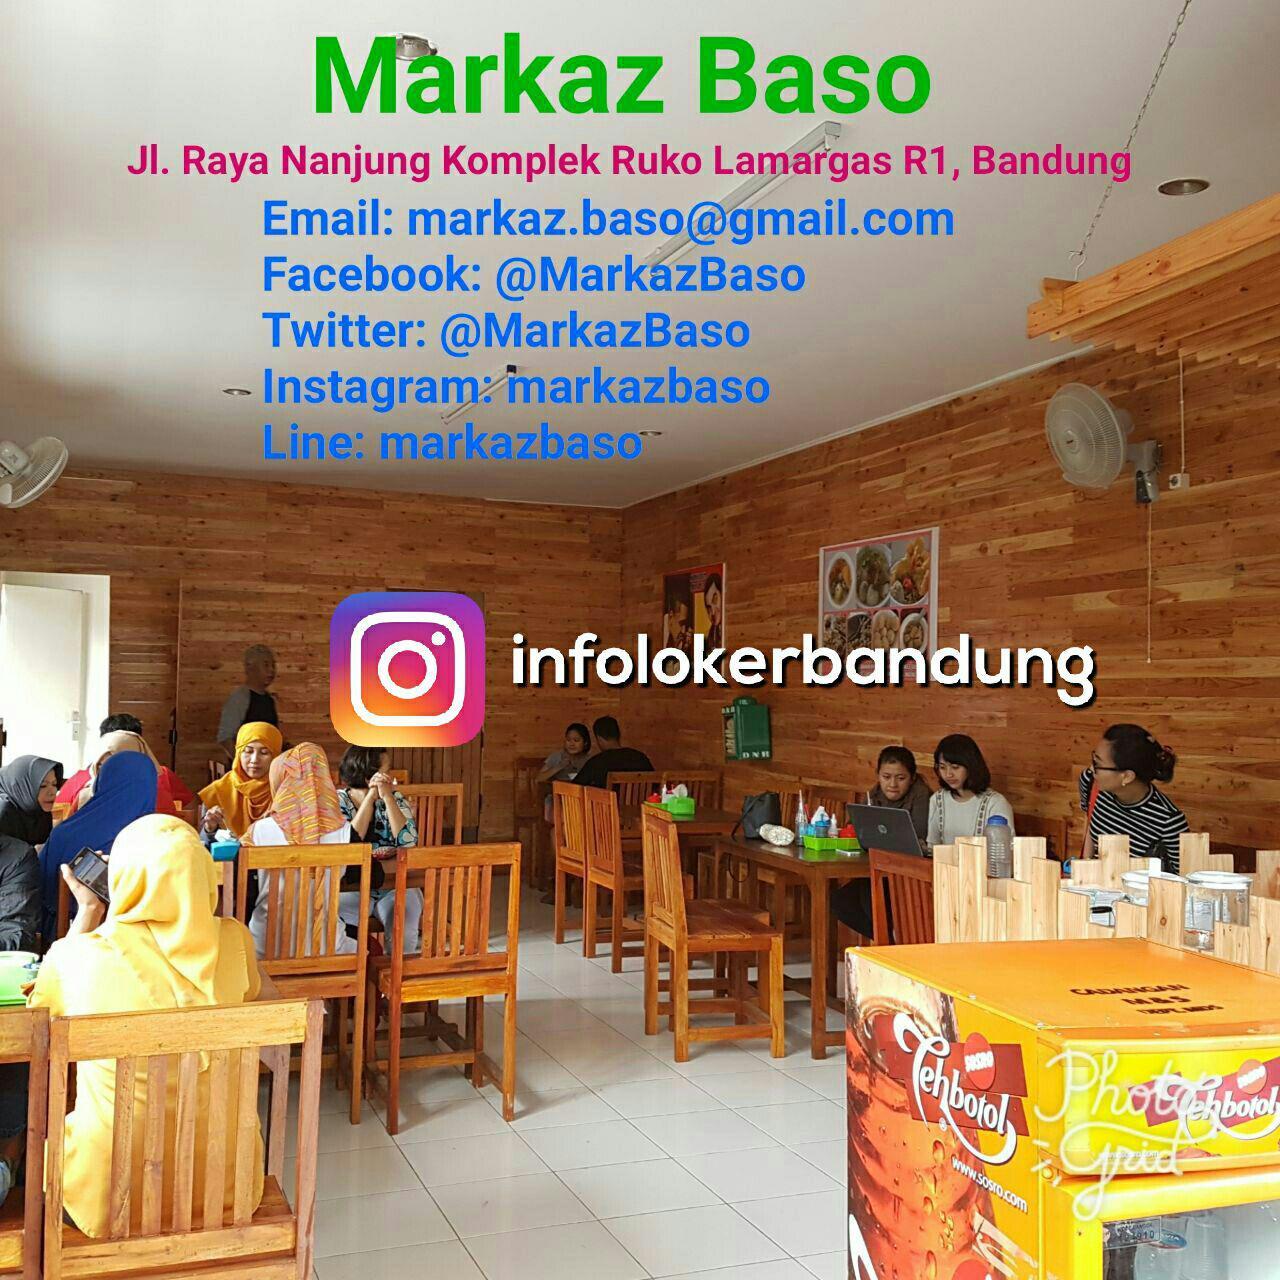 Lowongan Kerja Markaz Baso Bandung Juli 2017